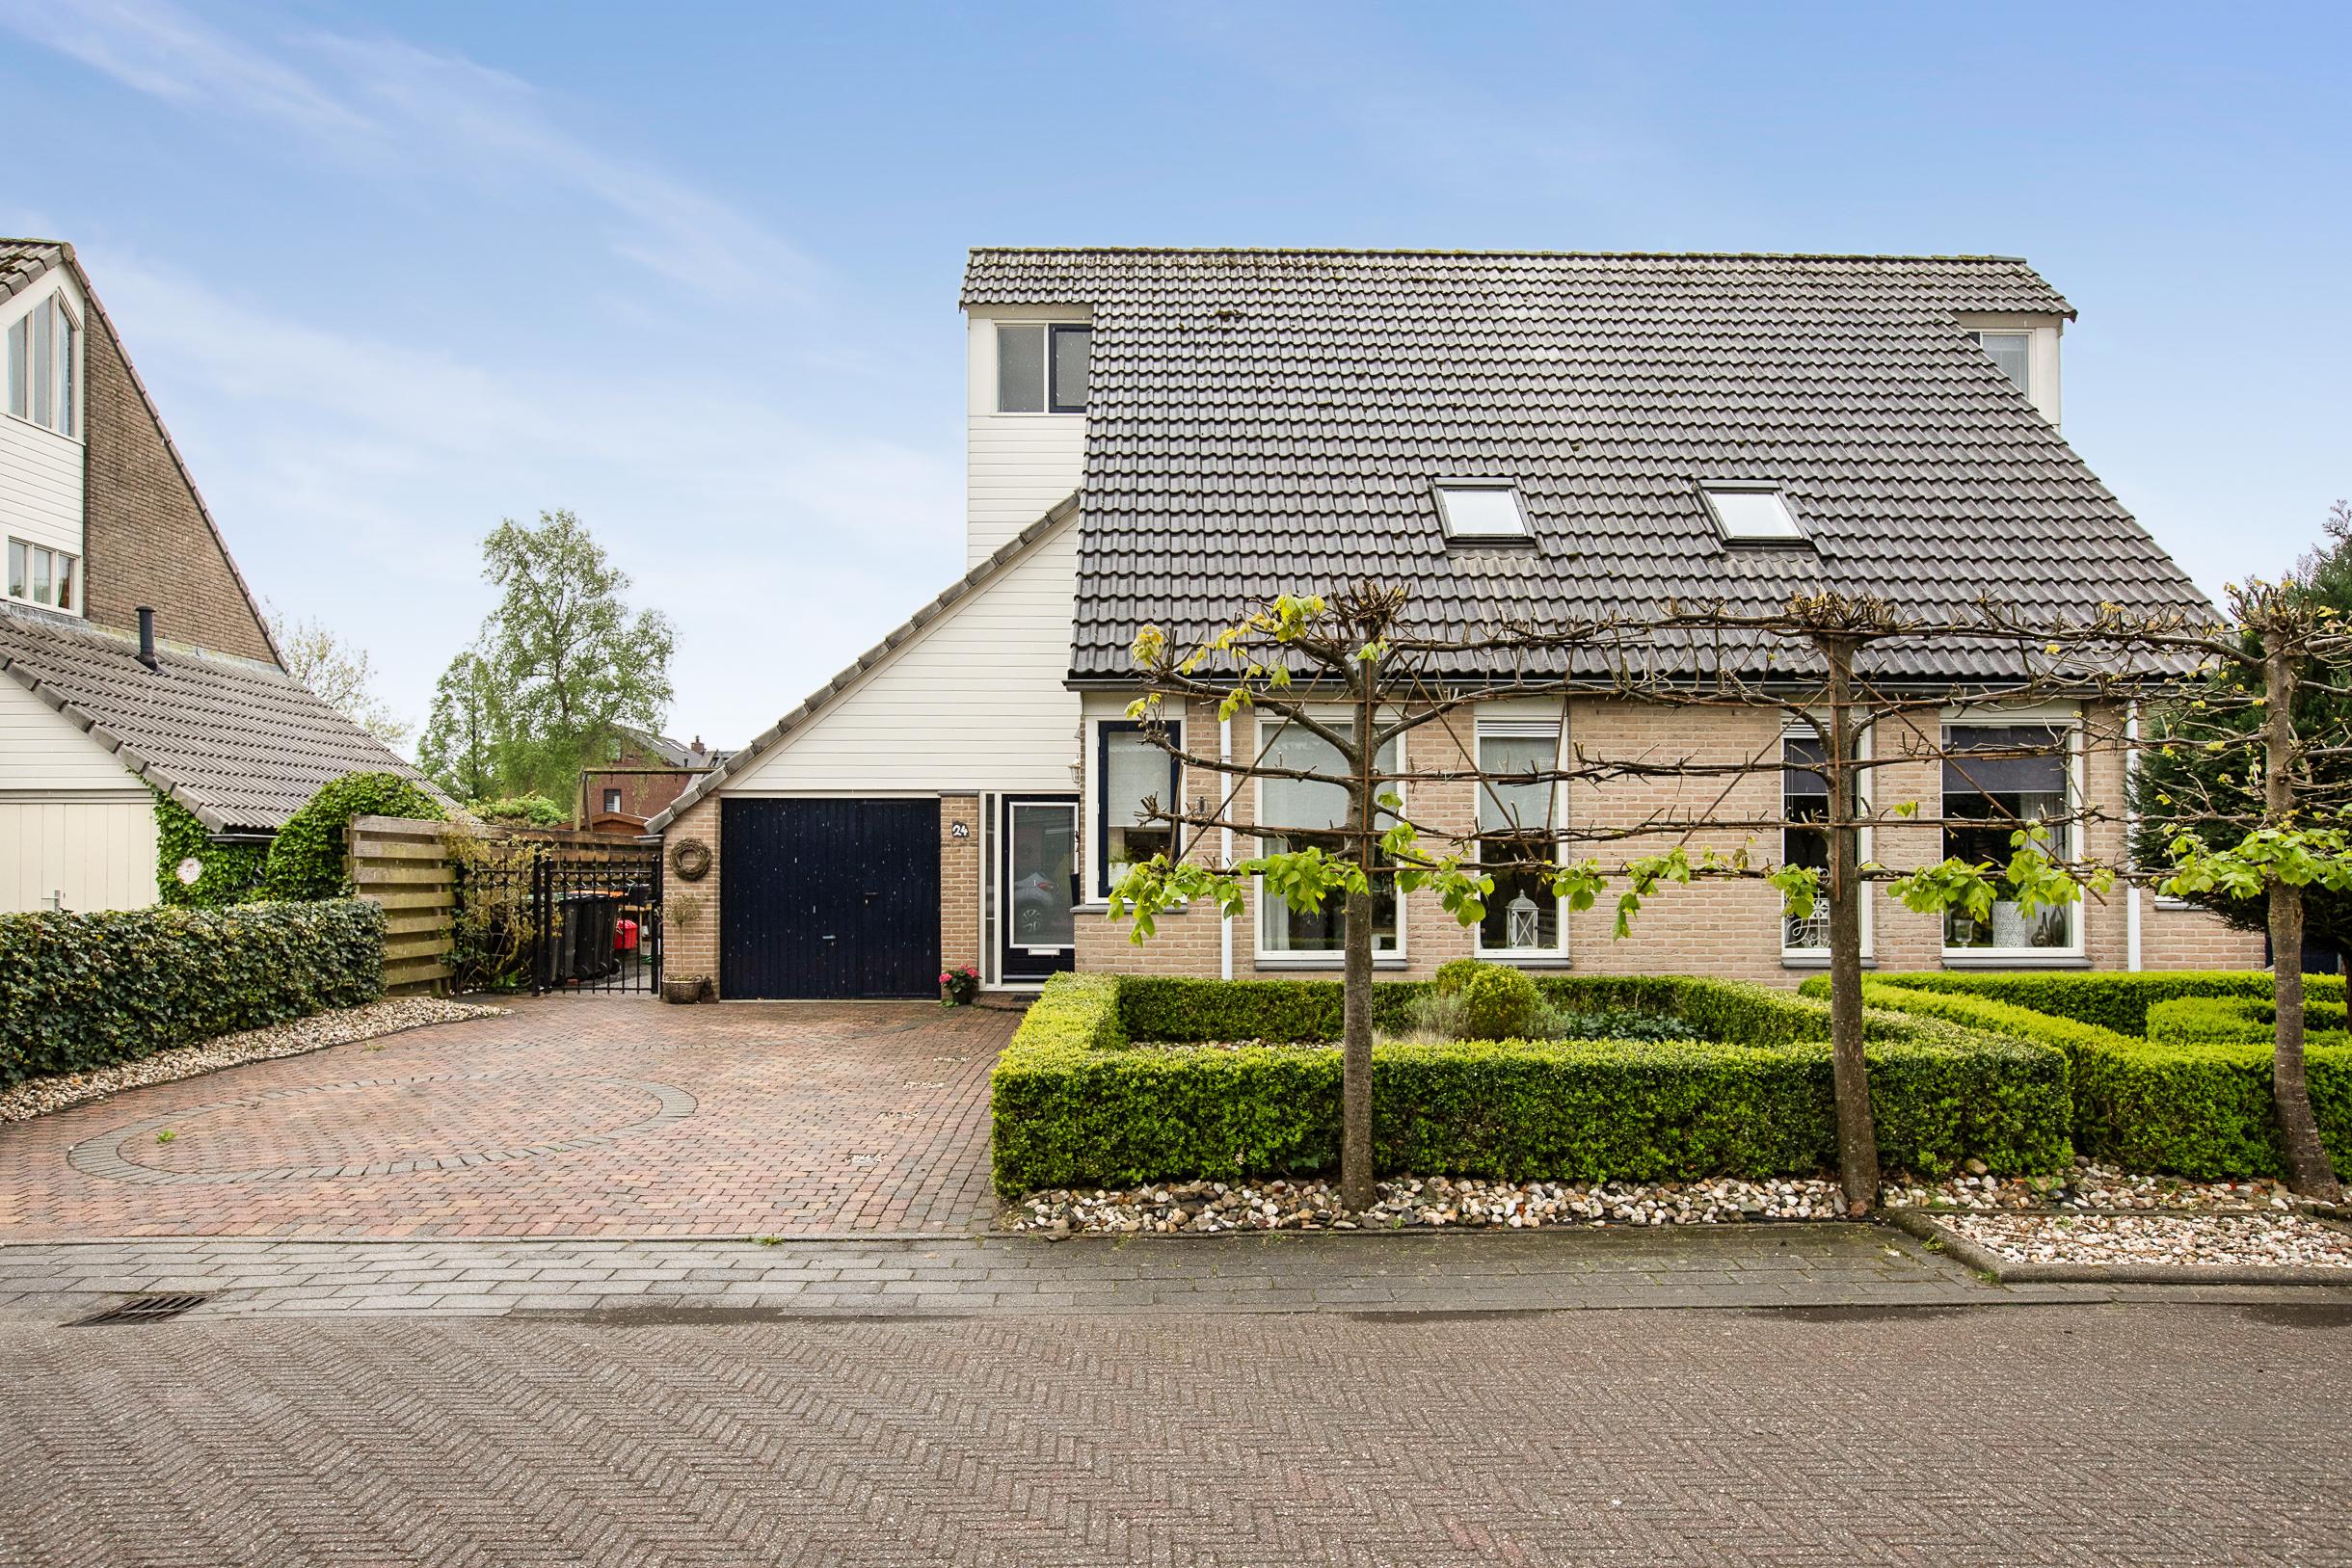 Leidekkersstraat 24 – Veendam